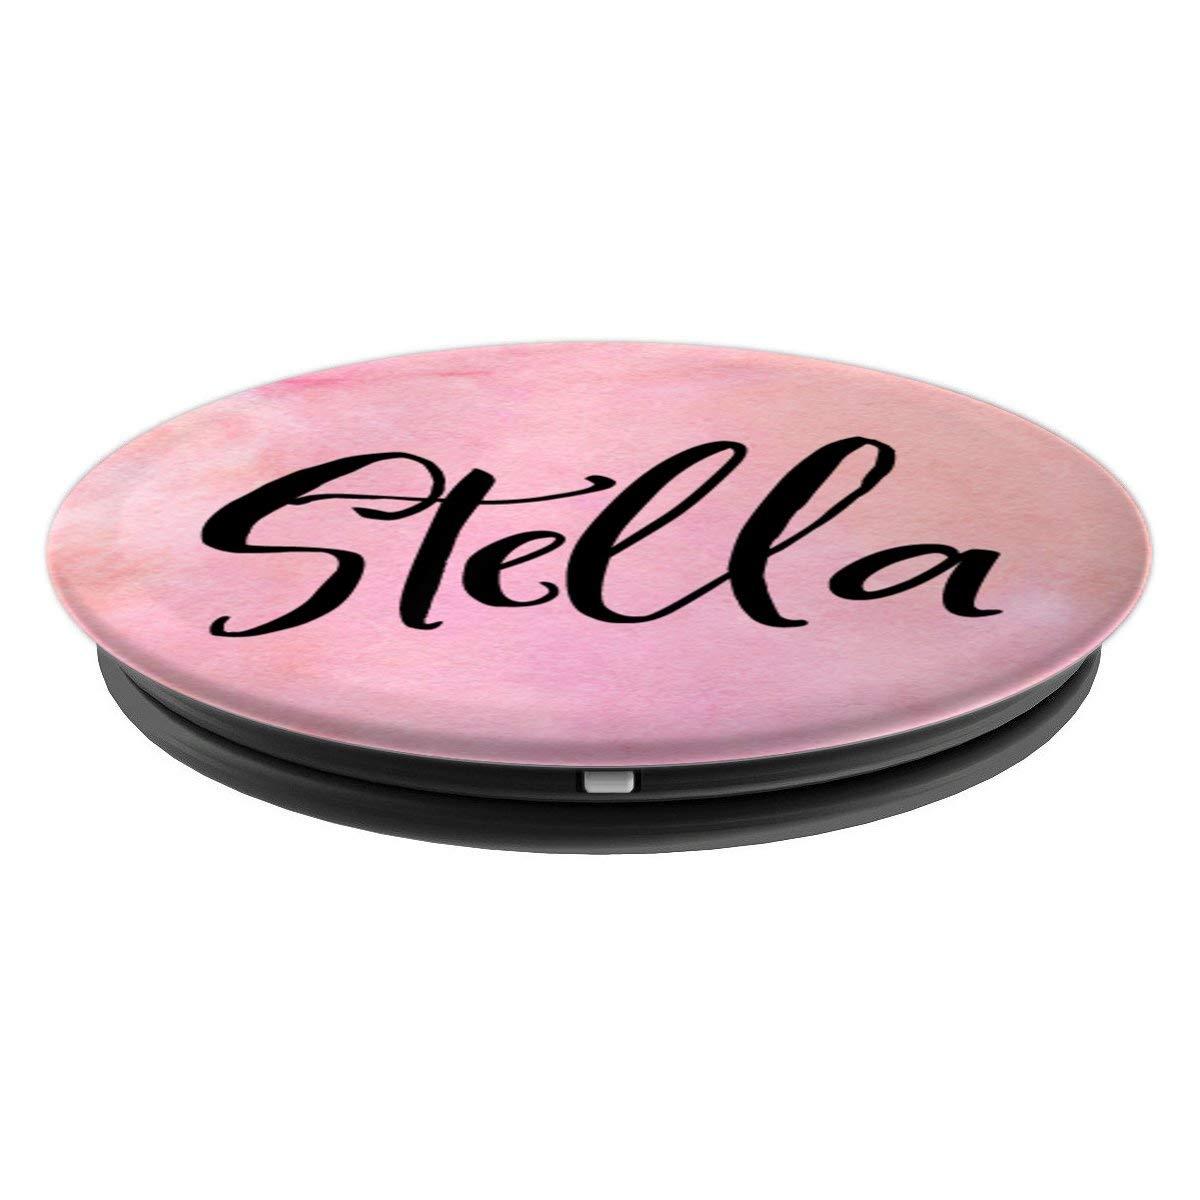 Amazon.com: Stella - Toma de pop personalizable para ...